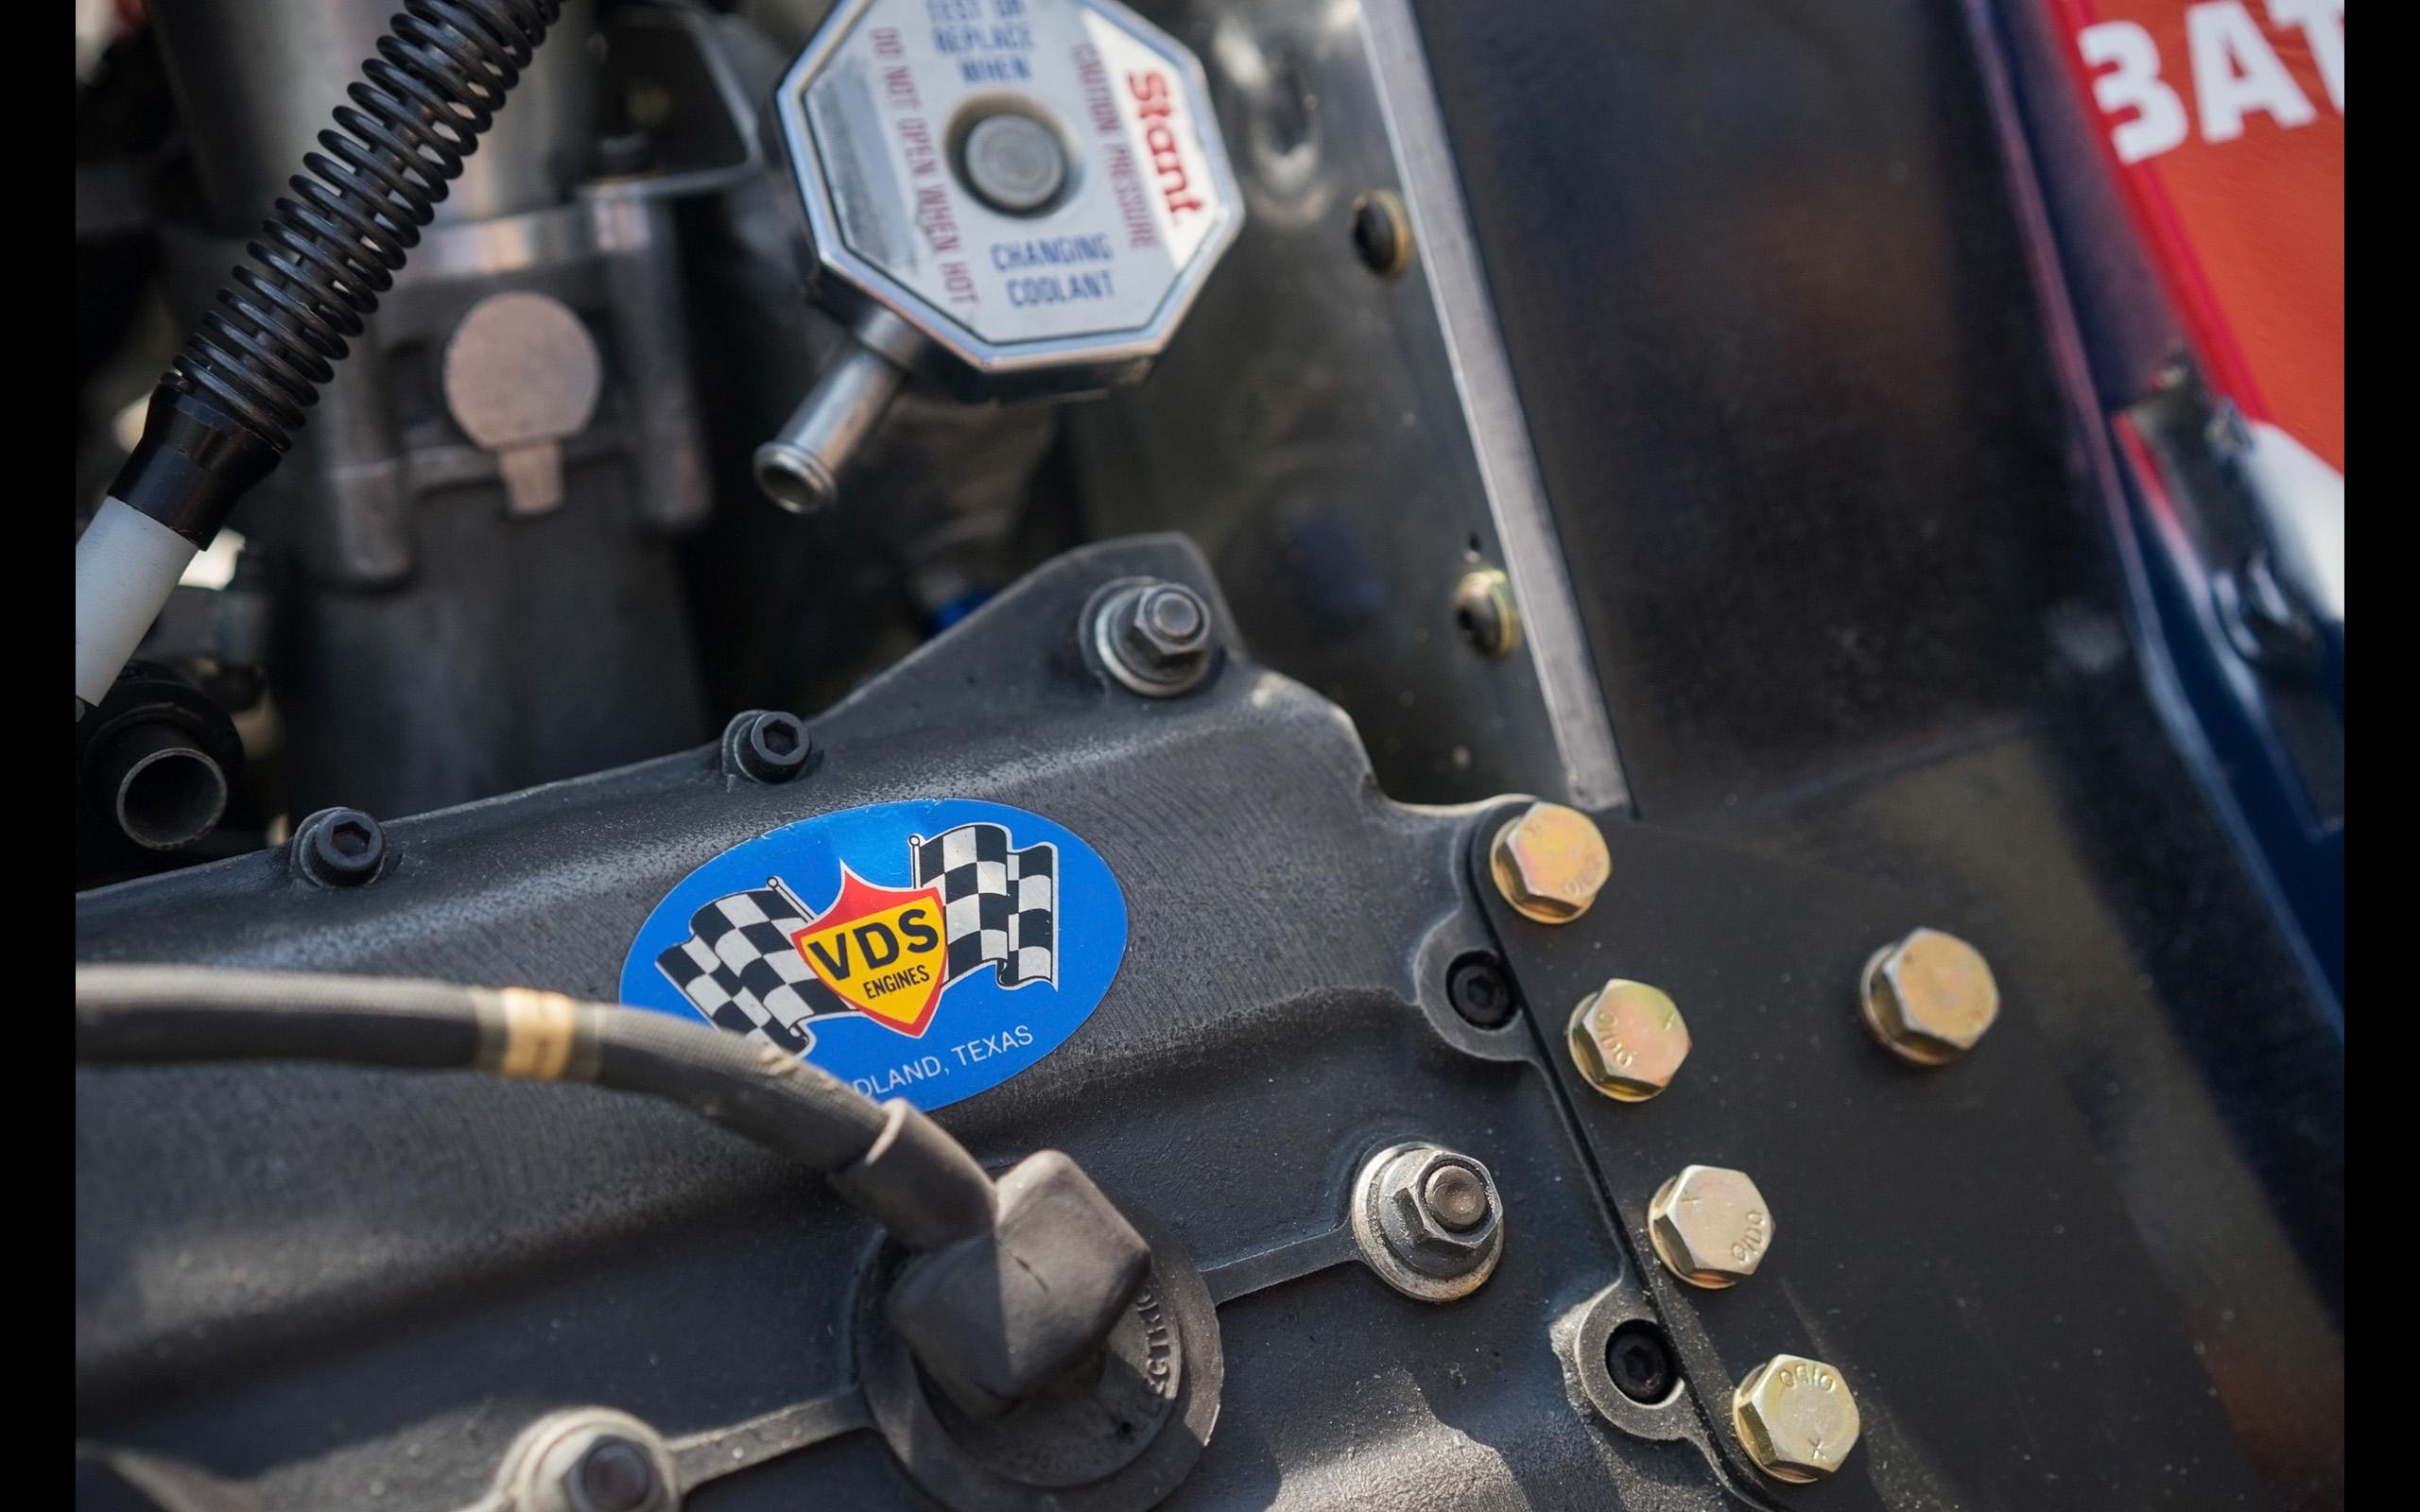 1990 Lola T9000 Valvoline Indy Car   Details   4   2560x1600 2560x1600